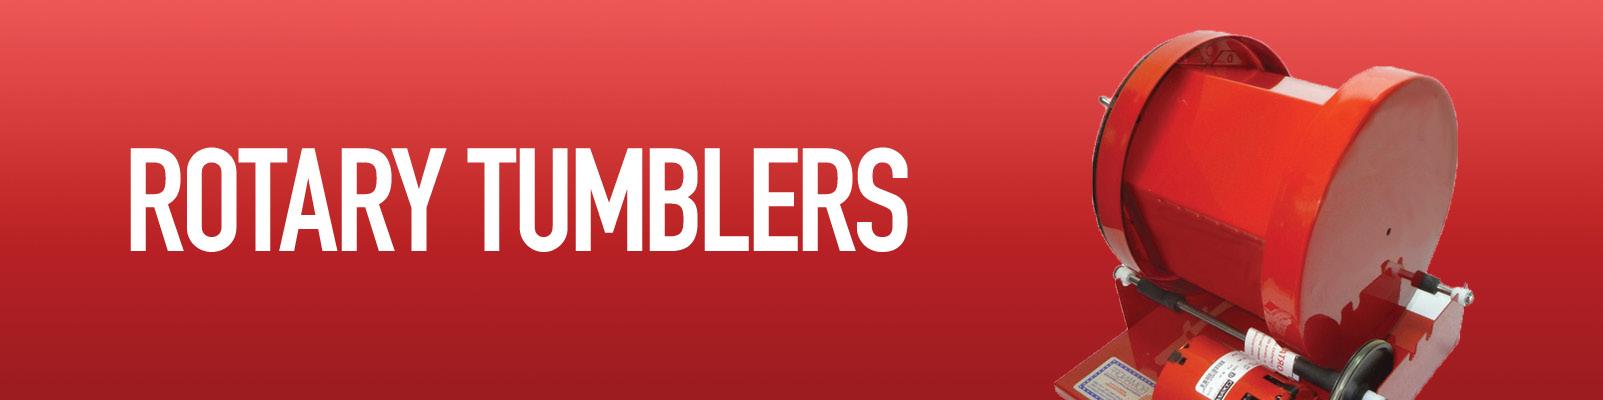 Rotary Tumblers